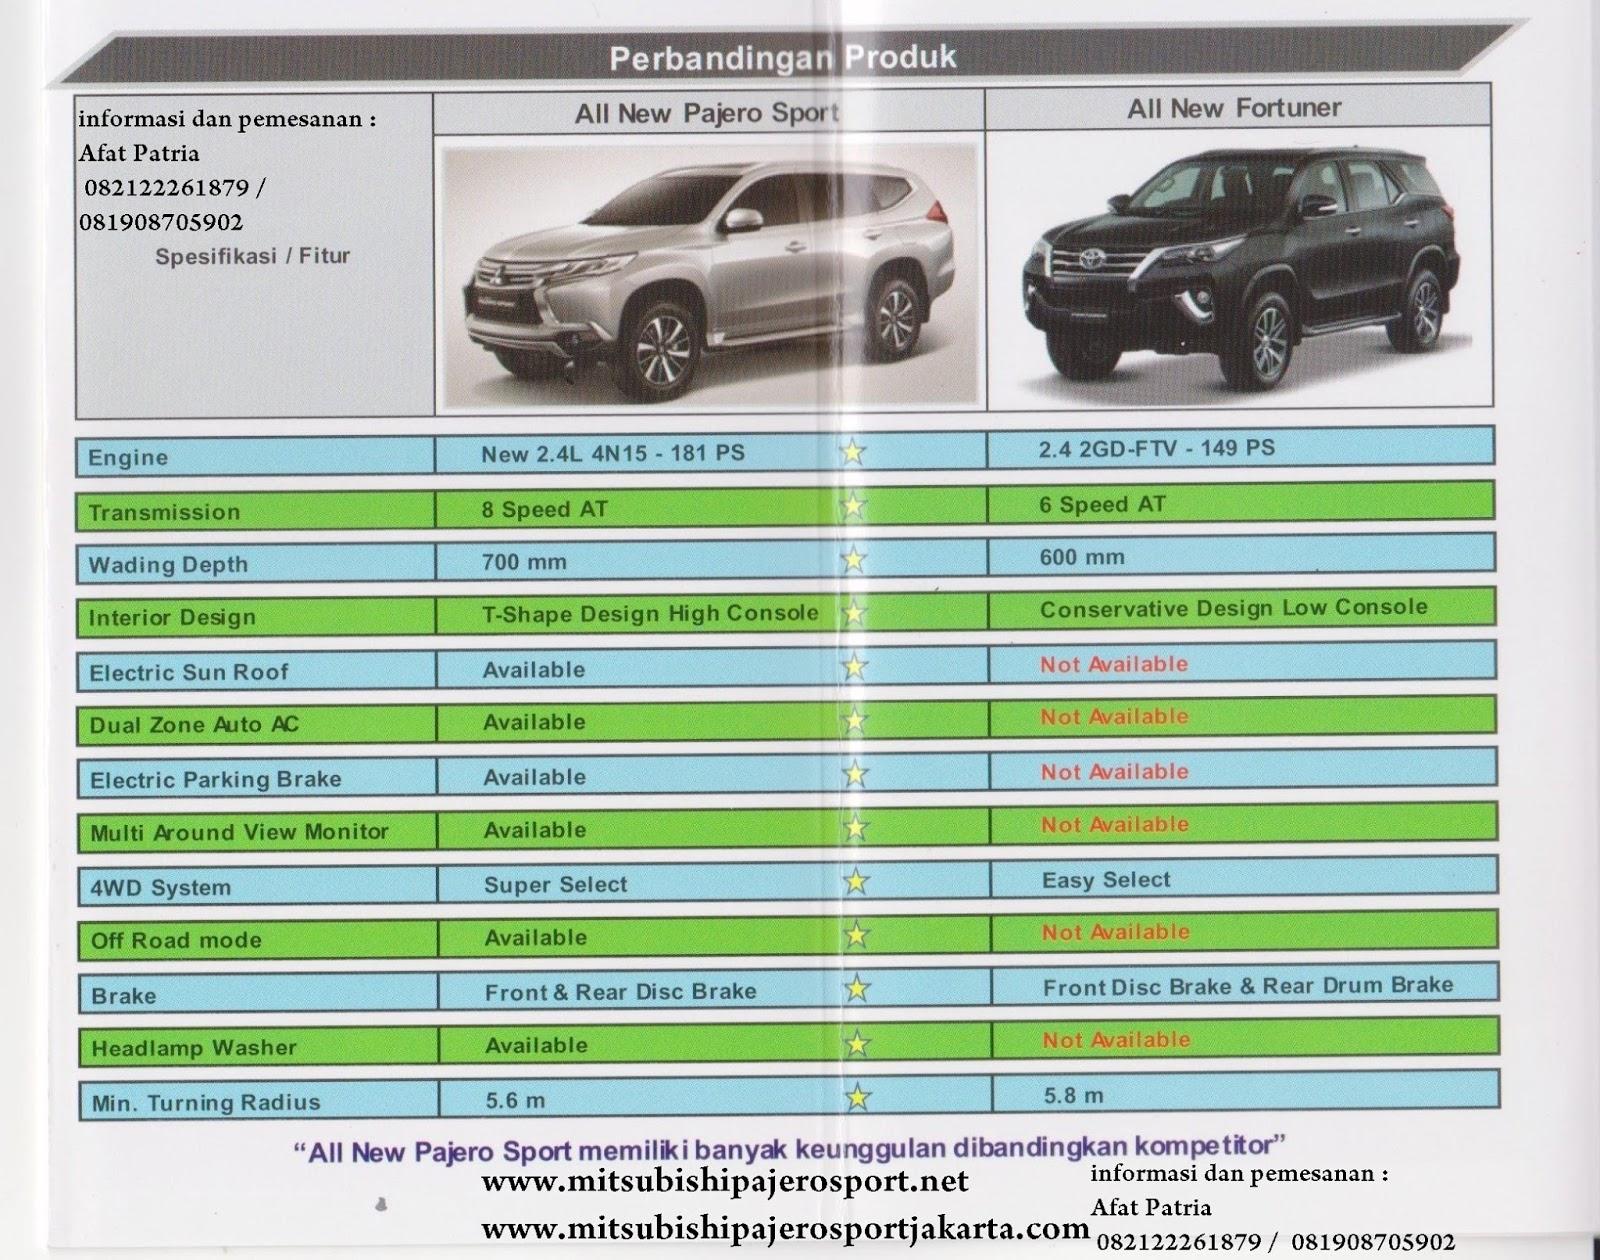 all new camry 2017 indonesia harga interior grand avanza veloz 1.5 dan spesifikasi fortuner vs pajero sport autos post